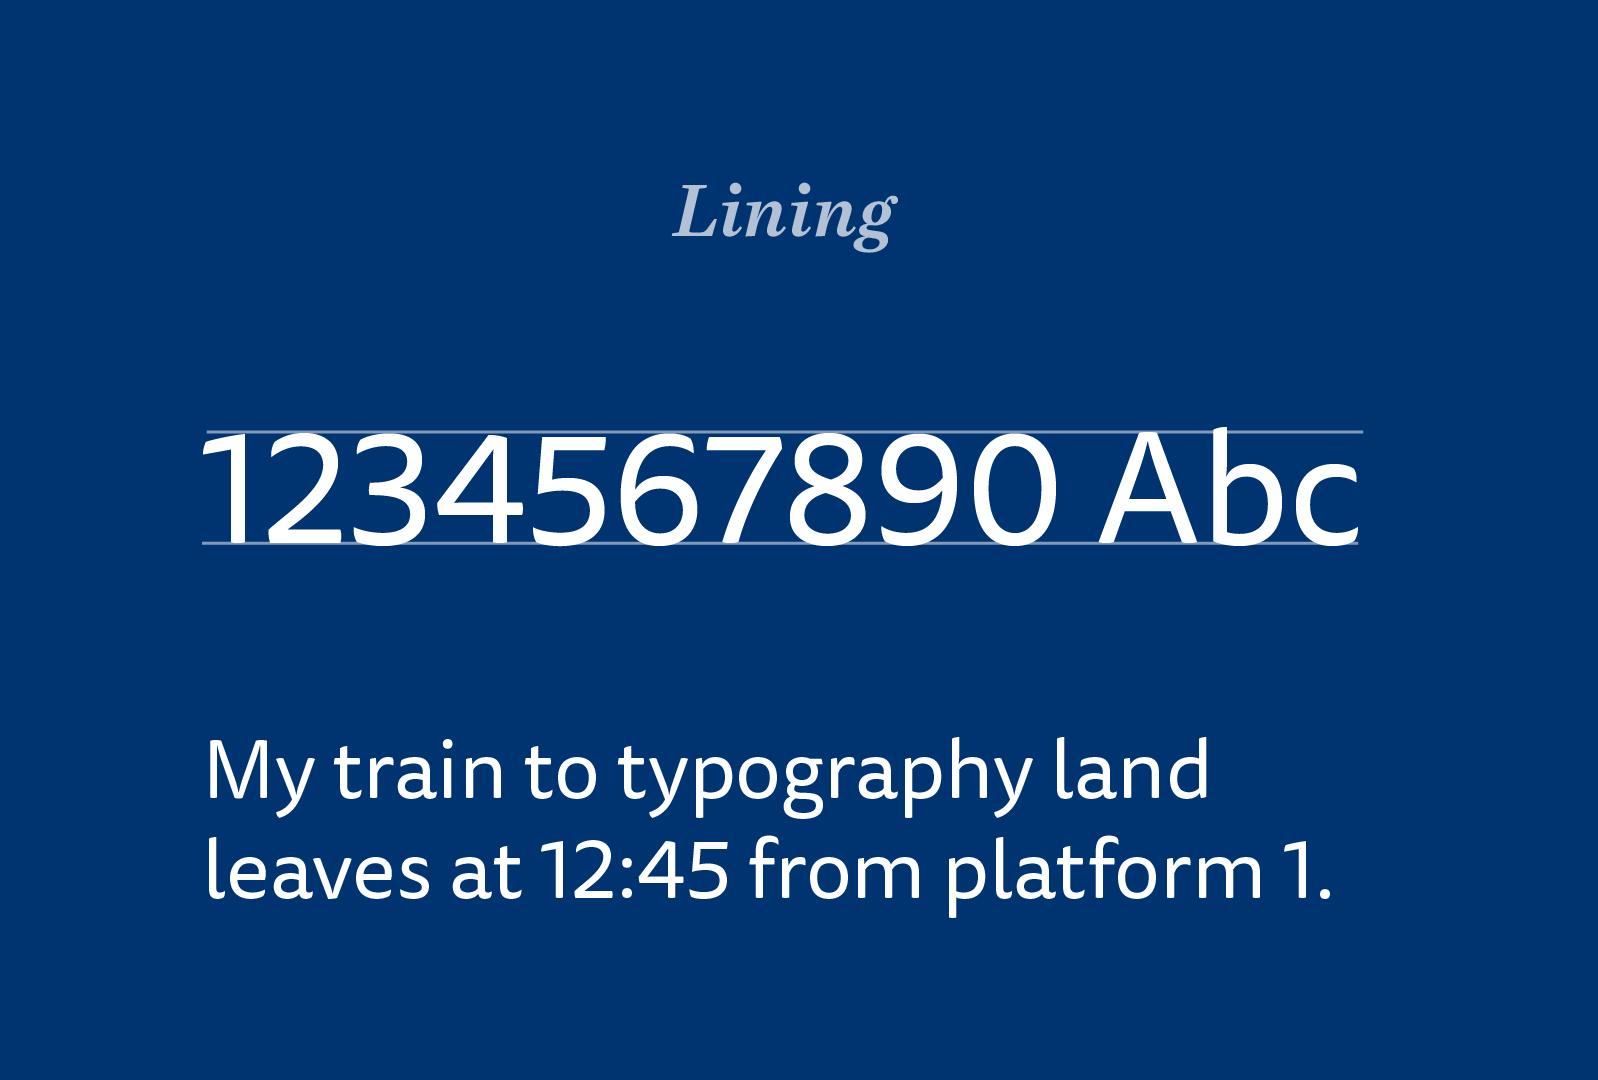 Lining figures